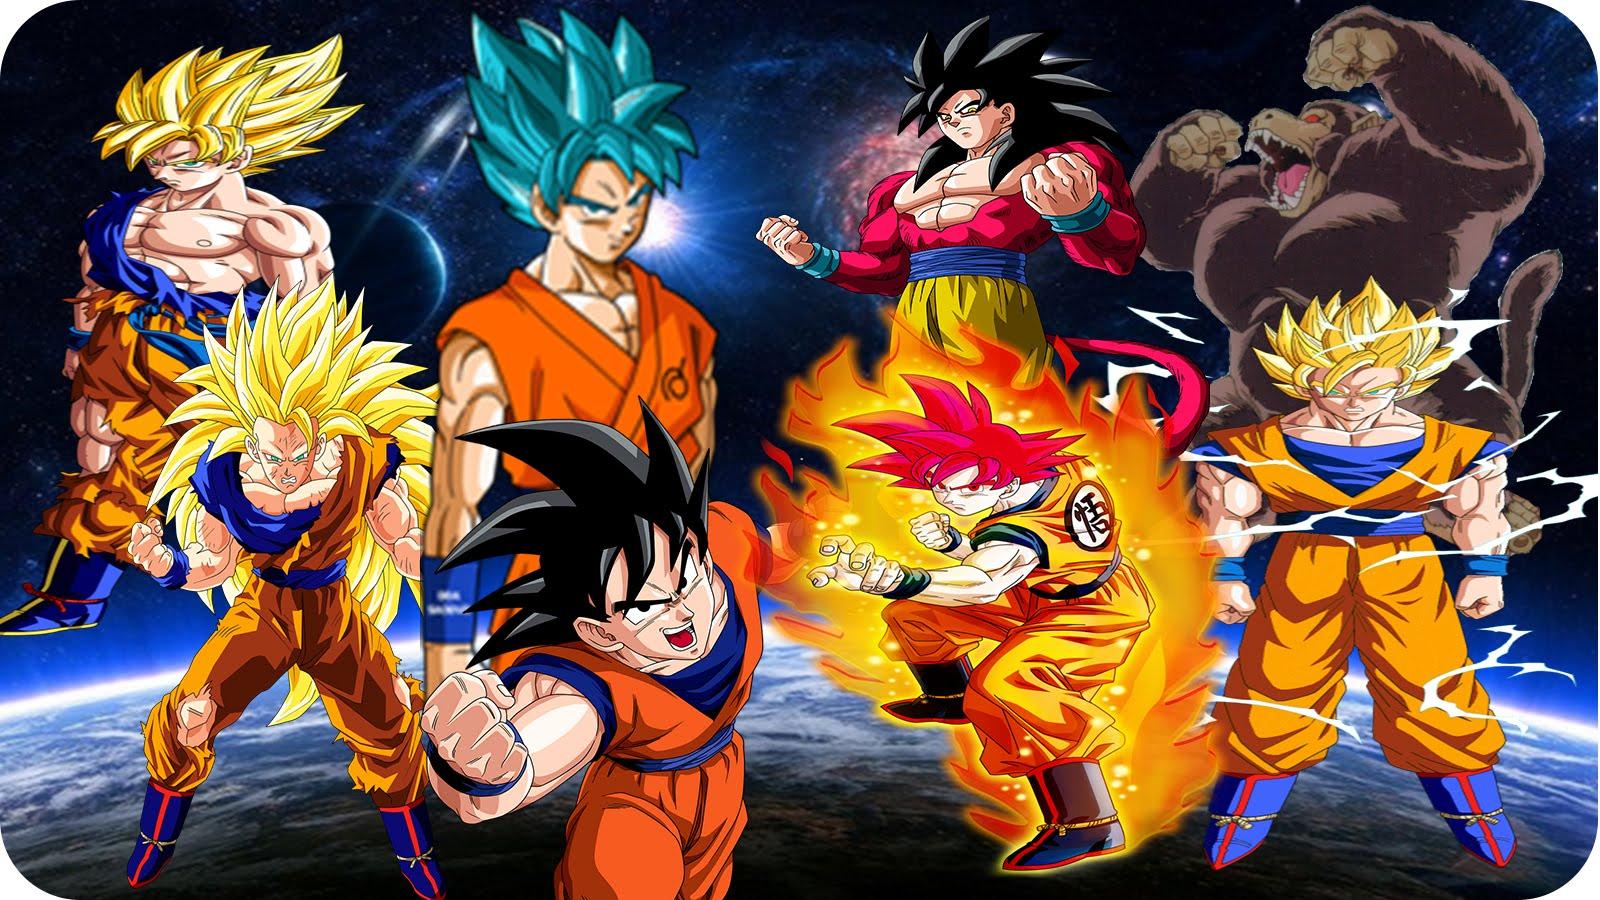 Imagenesde99 Imagenes De Goku Fase 10 Para Descargar: Imagen - Goku-1.jpg